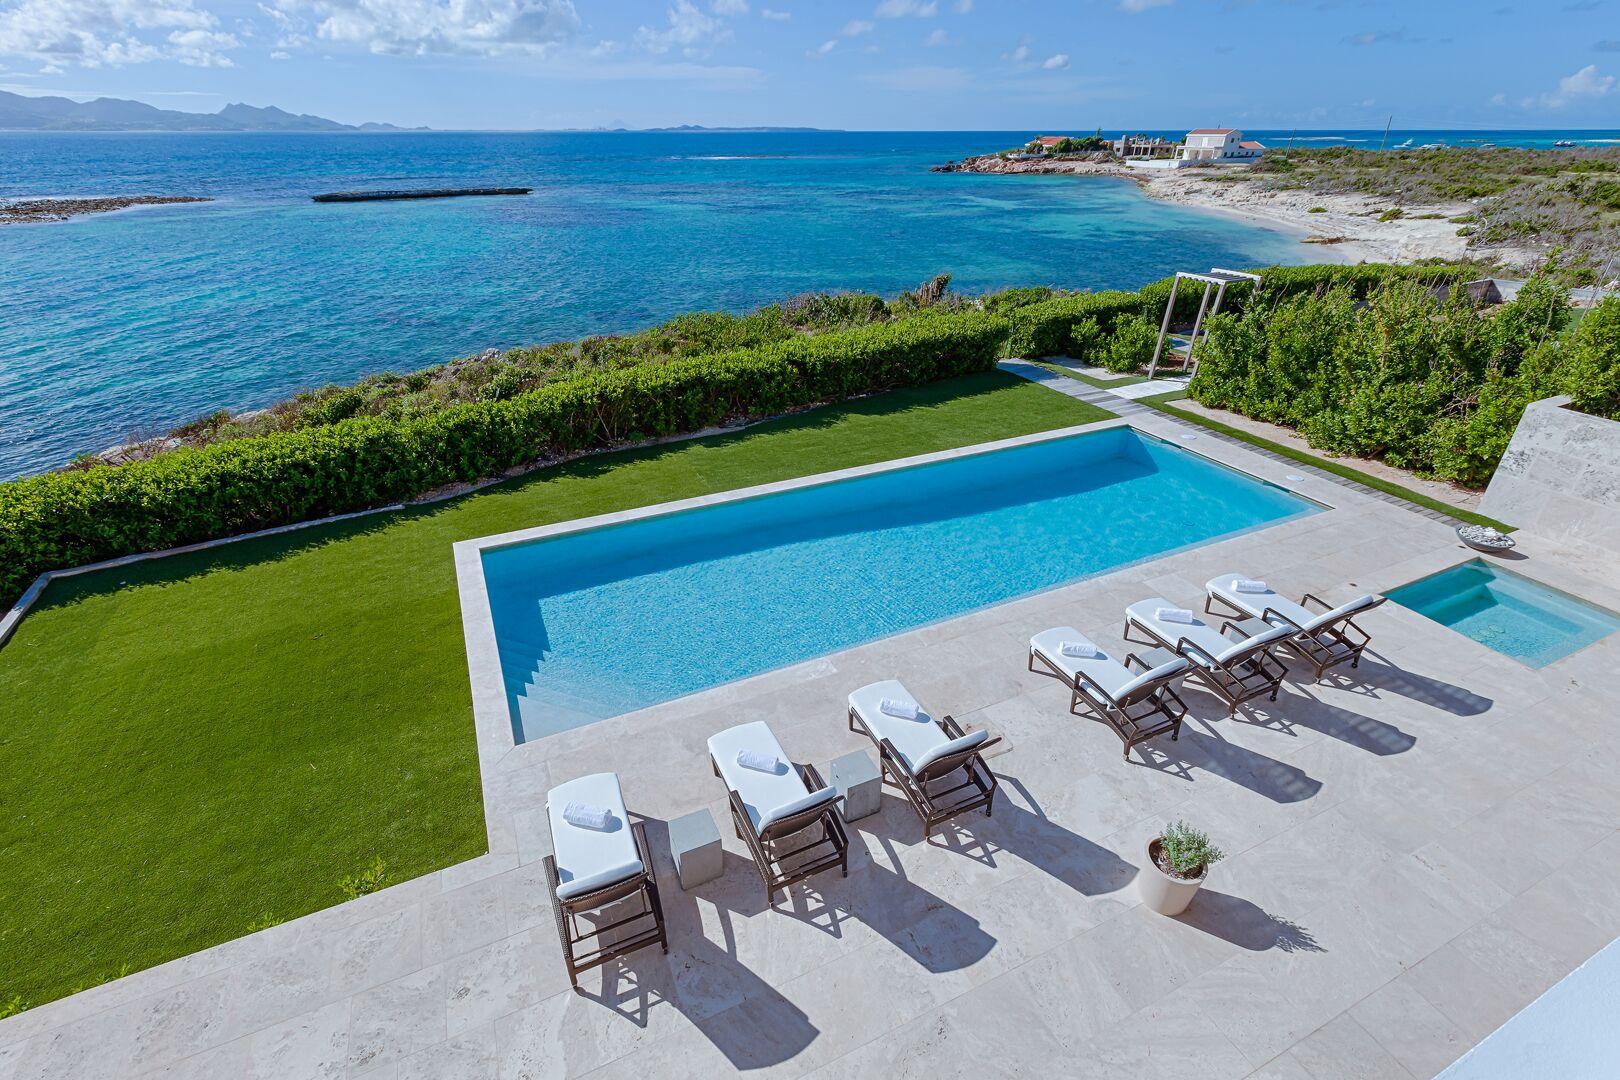 Anguilla Villa Beaches Edge New Pool on Ocean